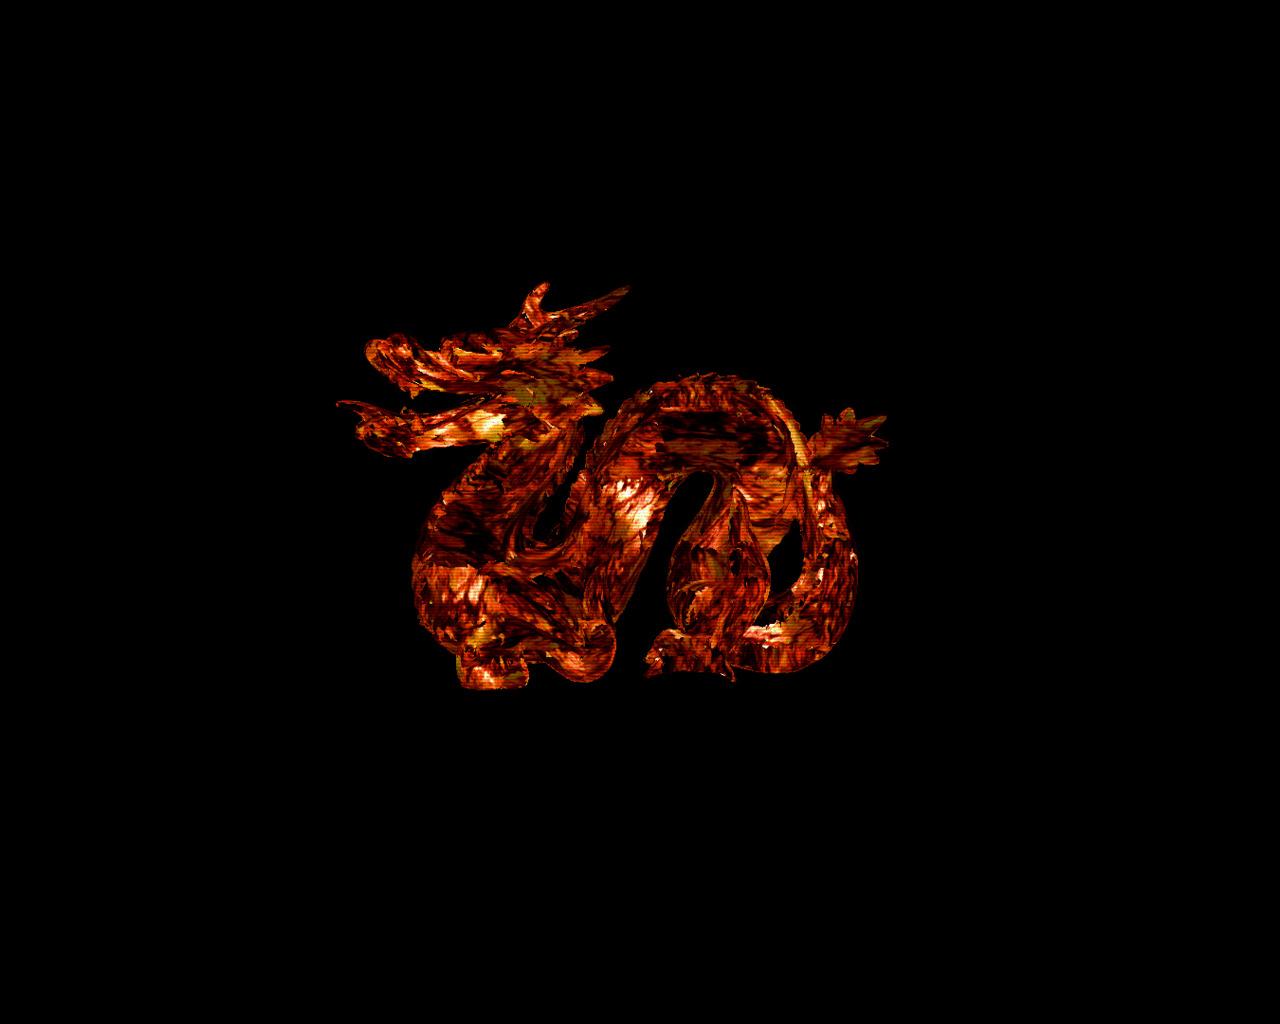 dragon-3d-qhd.jpg